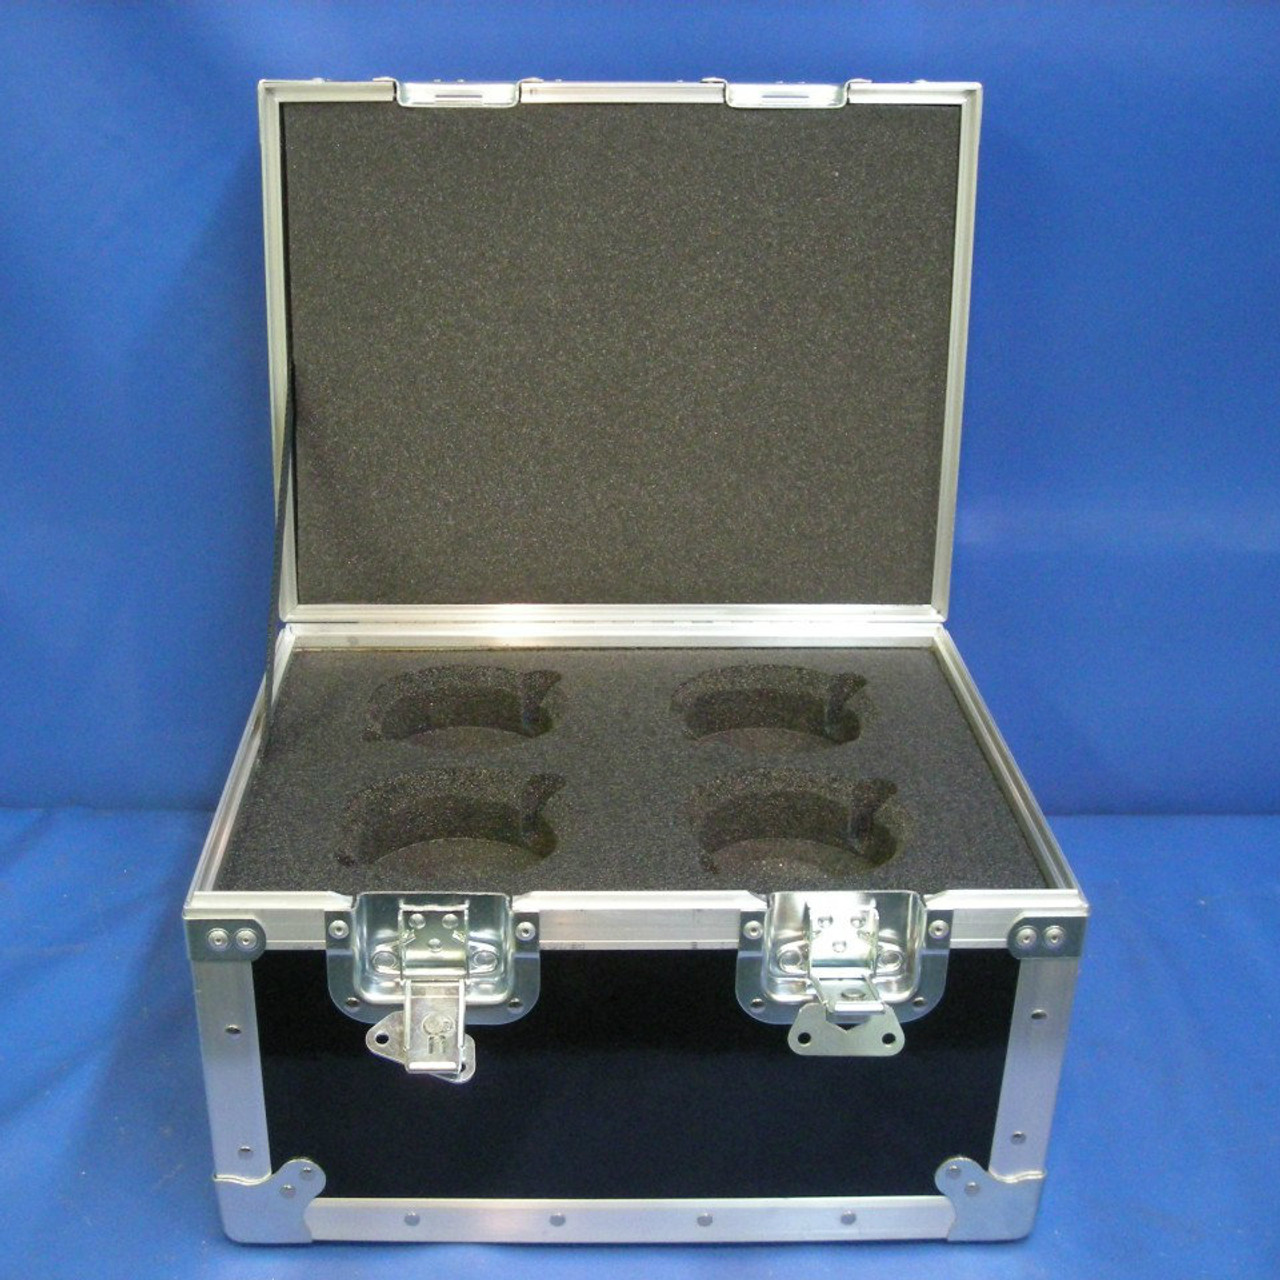 Arri Ultra Prime (4 Position) Custom ATA Shipping Case - Interior View Lid